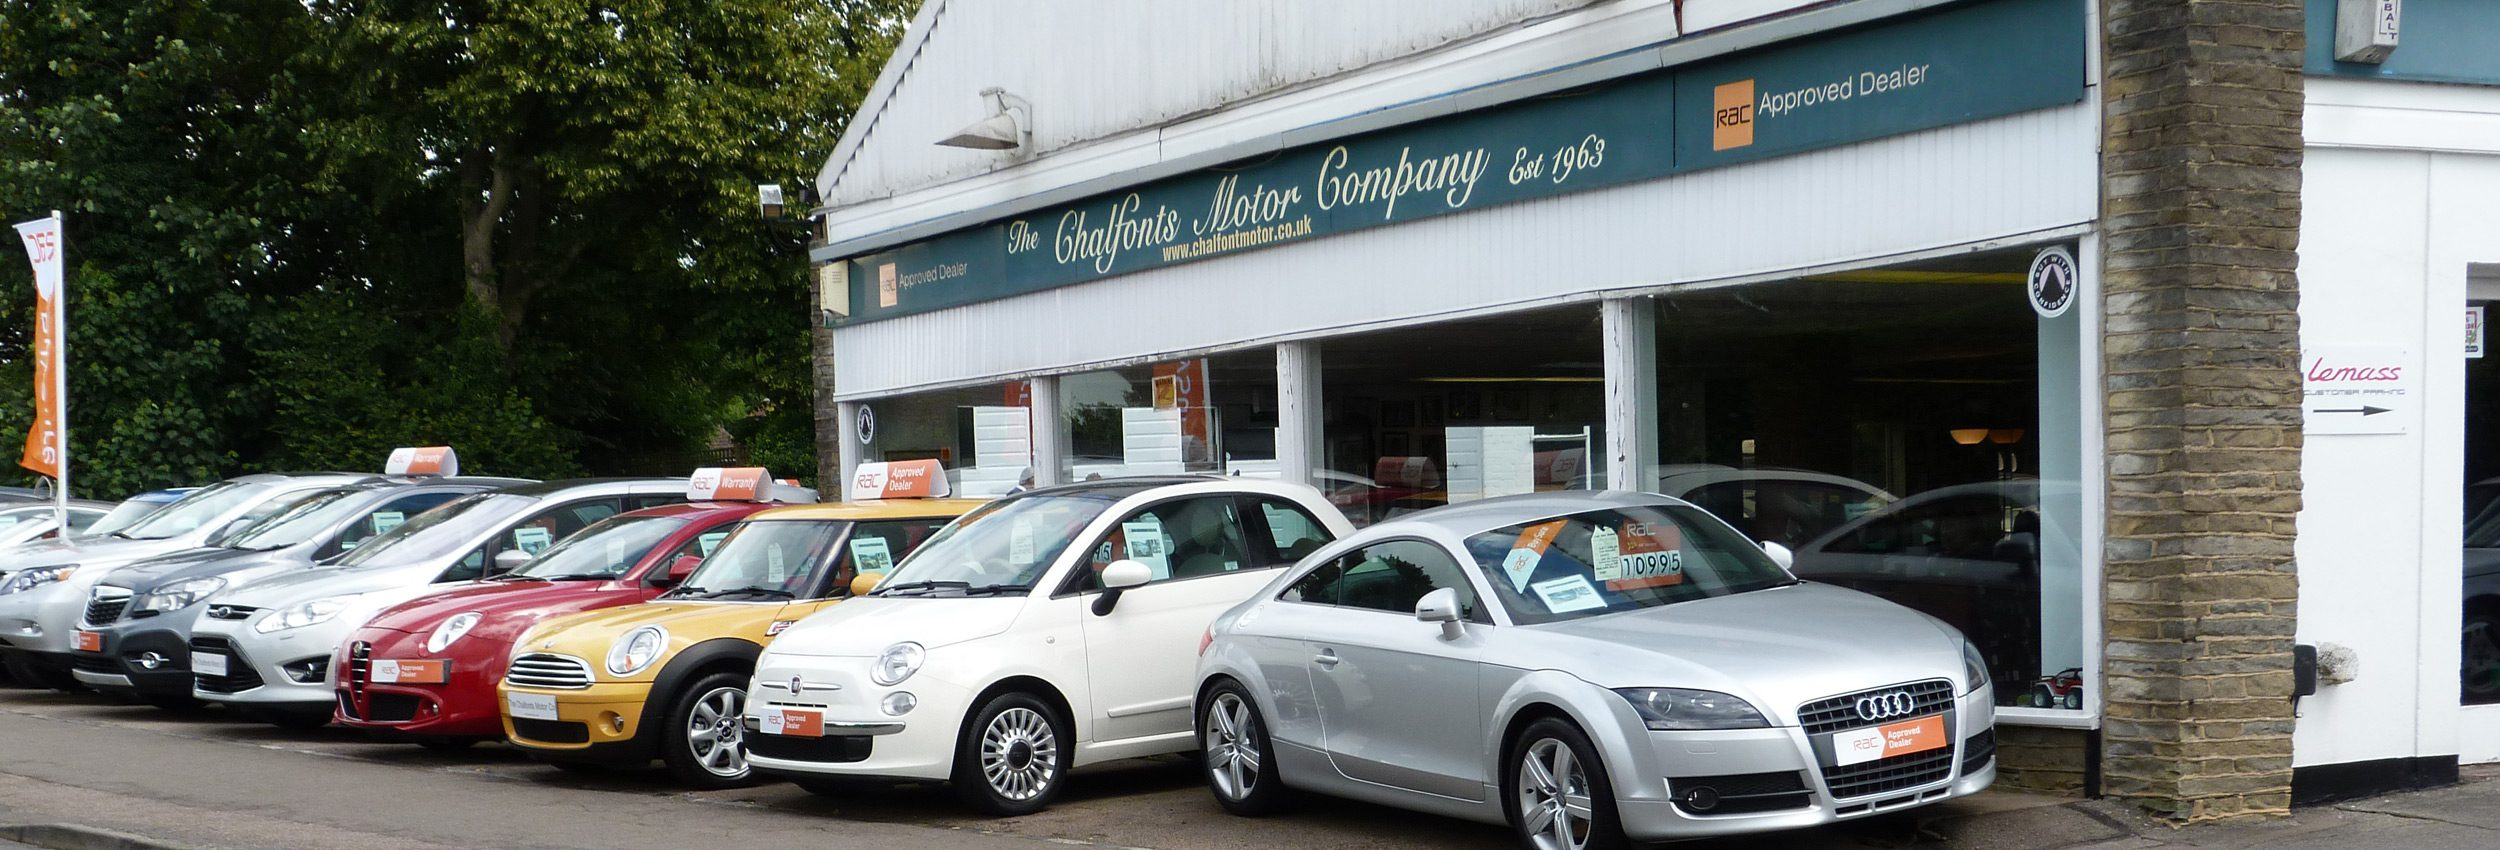 Rac Buysure The Chalfonts Motor Company